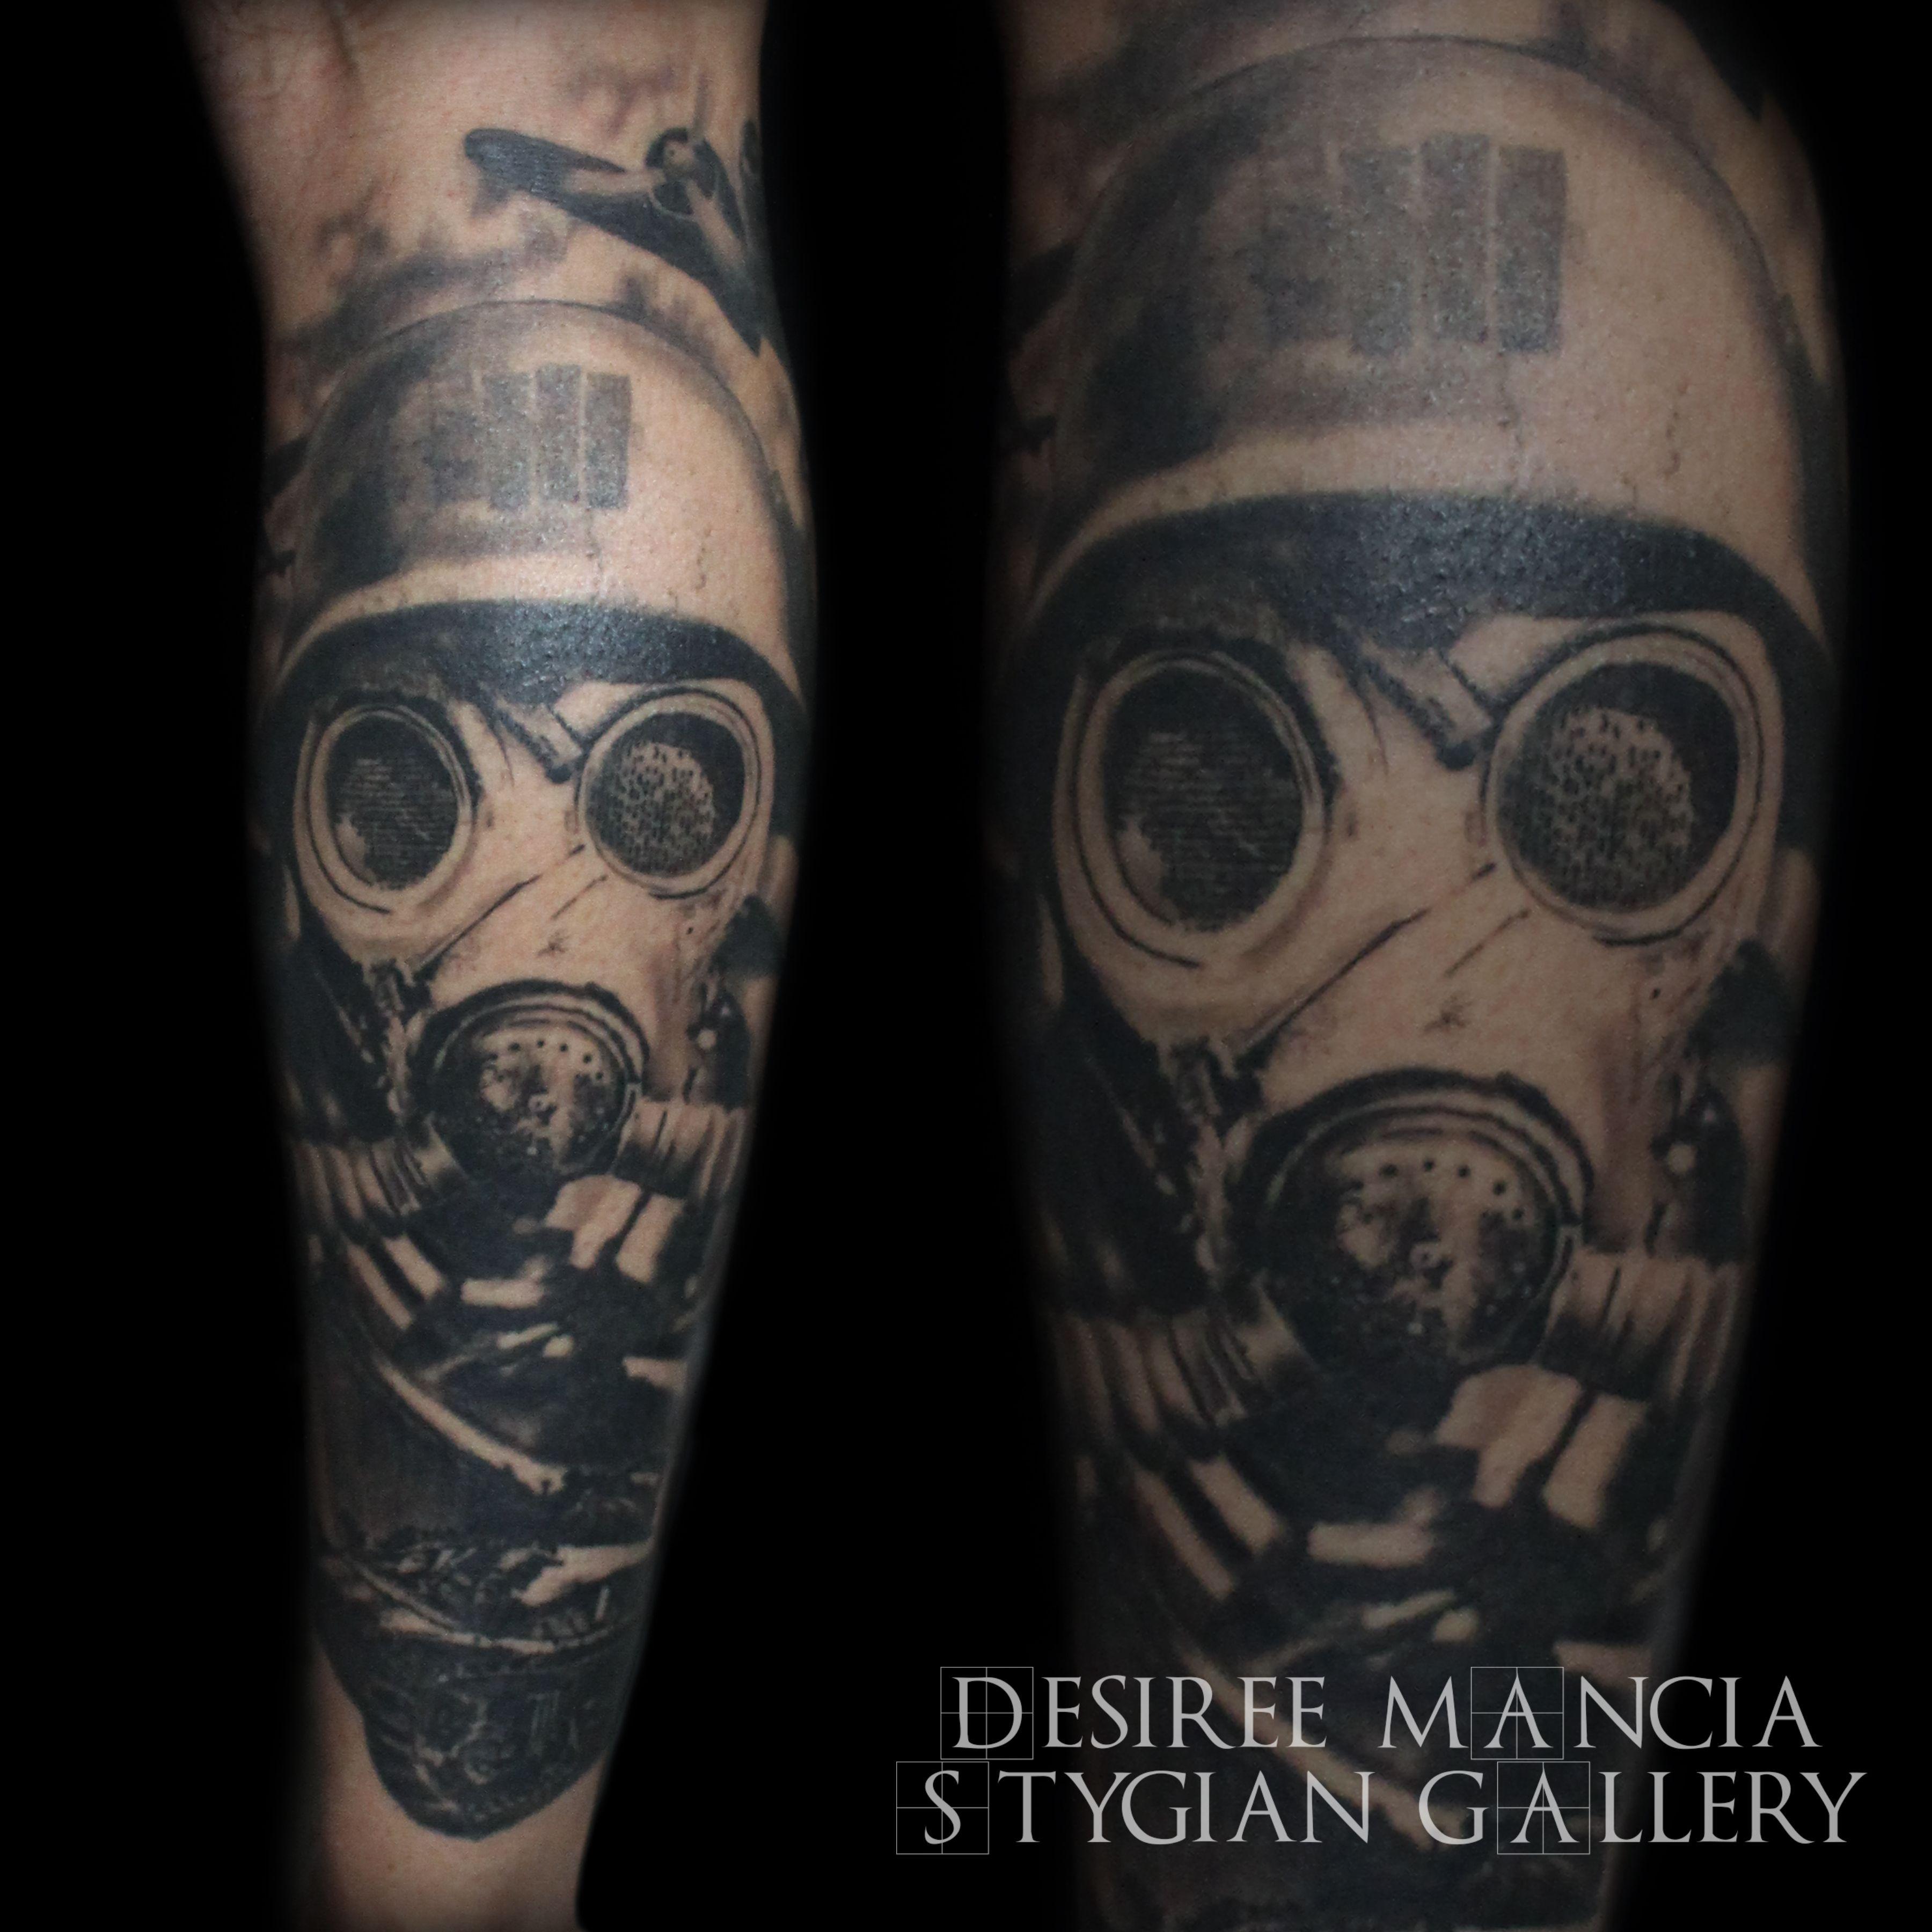 Desiree mancia tattooer at stygian gallery atlanta tank